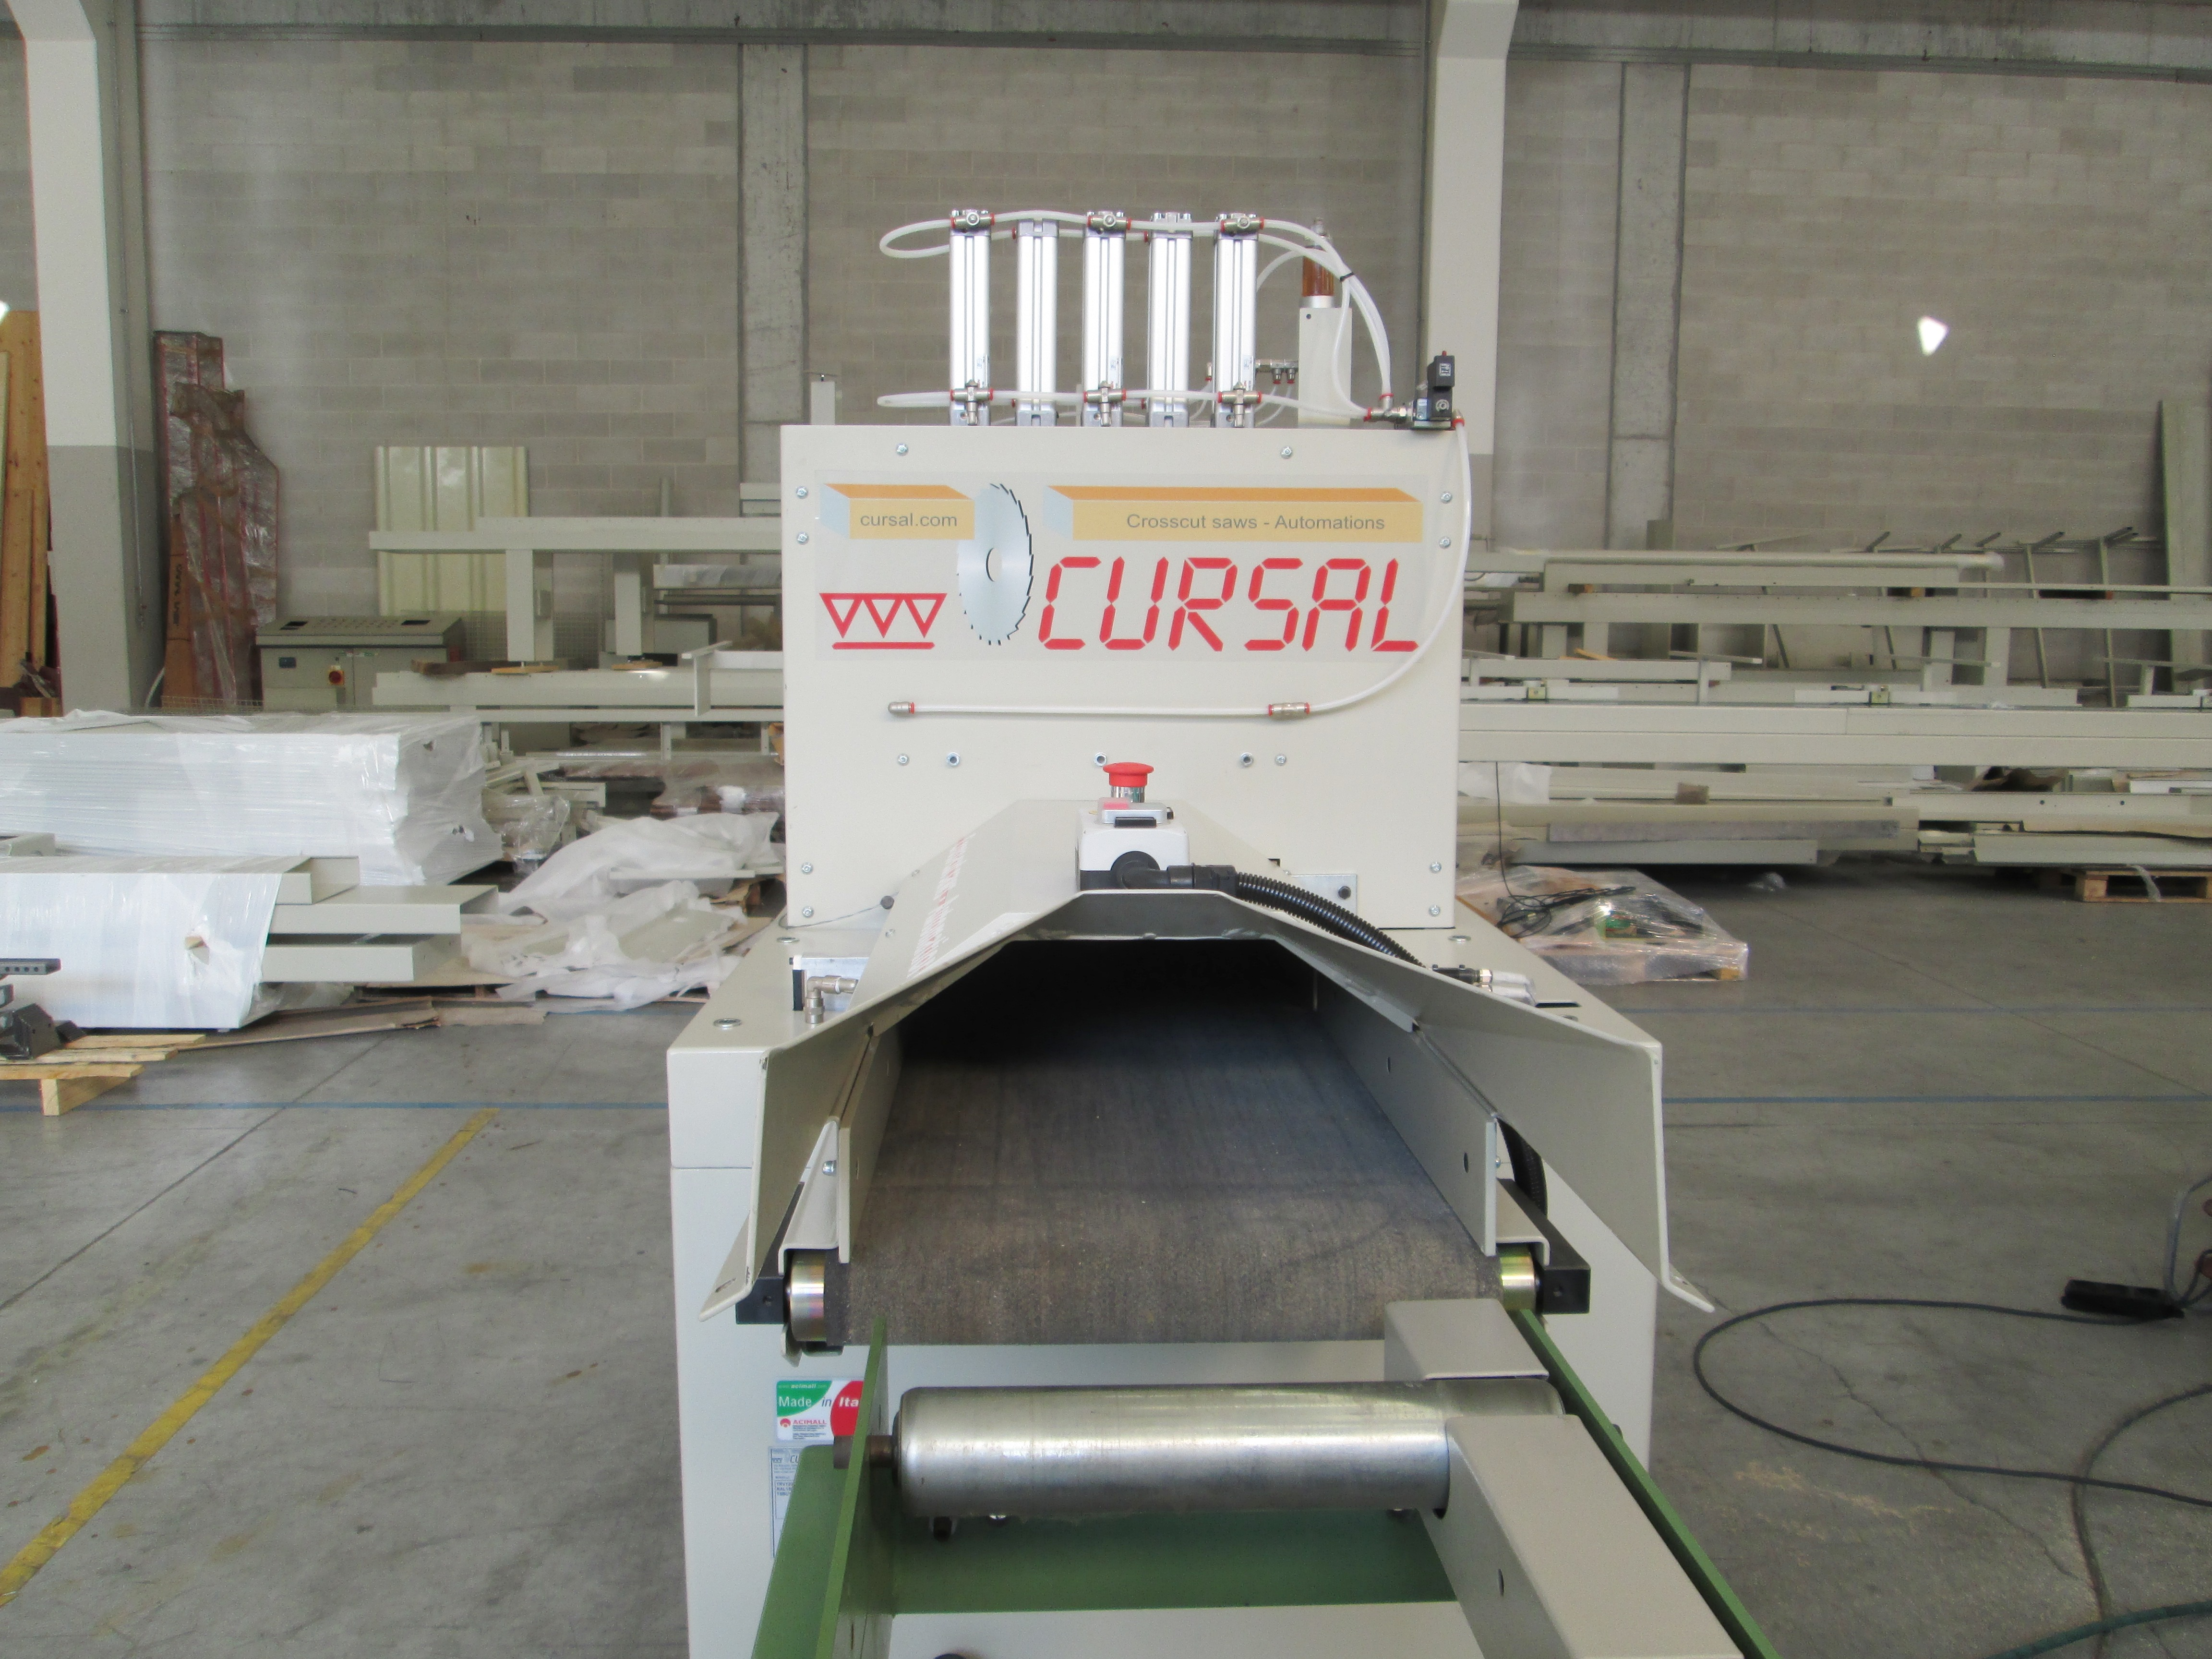 cursal-florian legno-trv 1200L 550 (1)